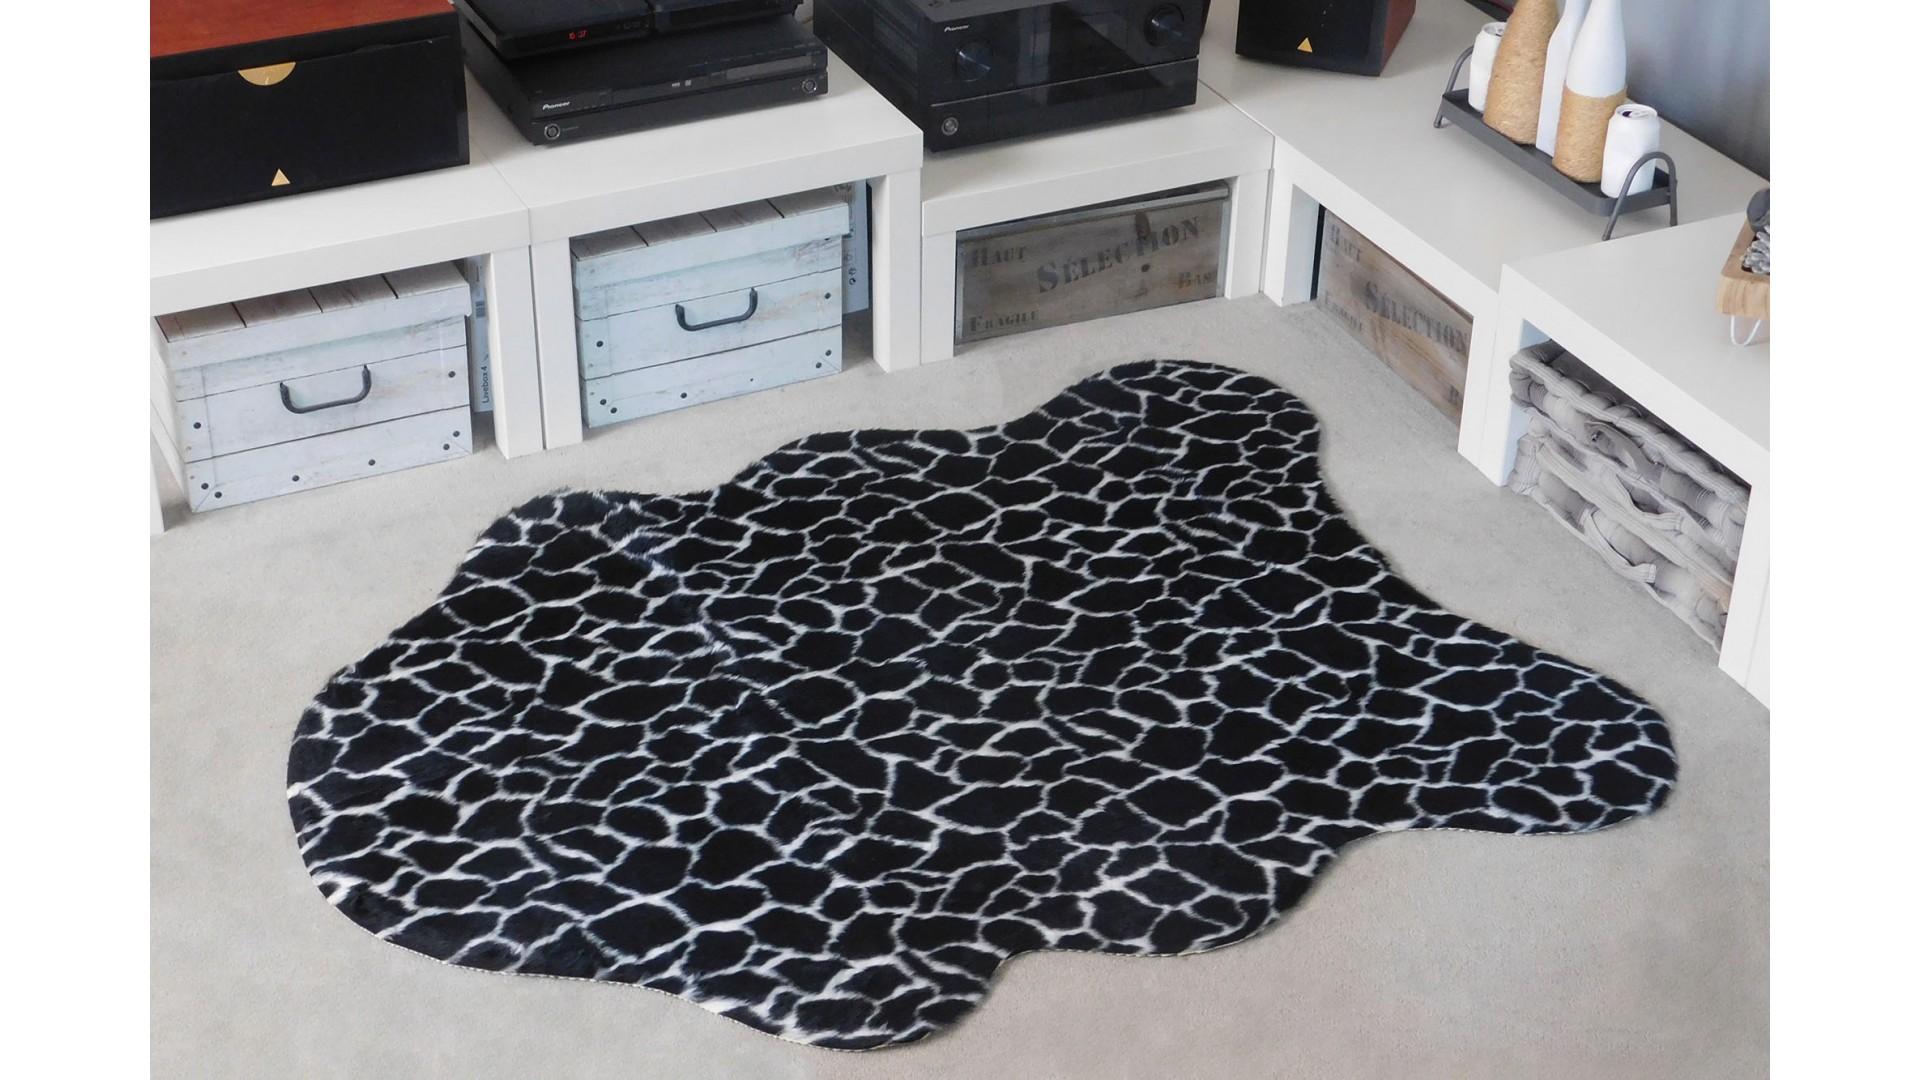 Tapis salon PEAU DE BÊTE girafe noire DEBONSOL